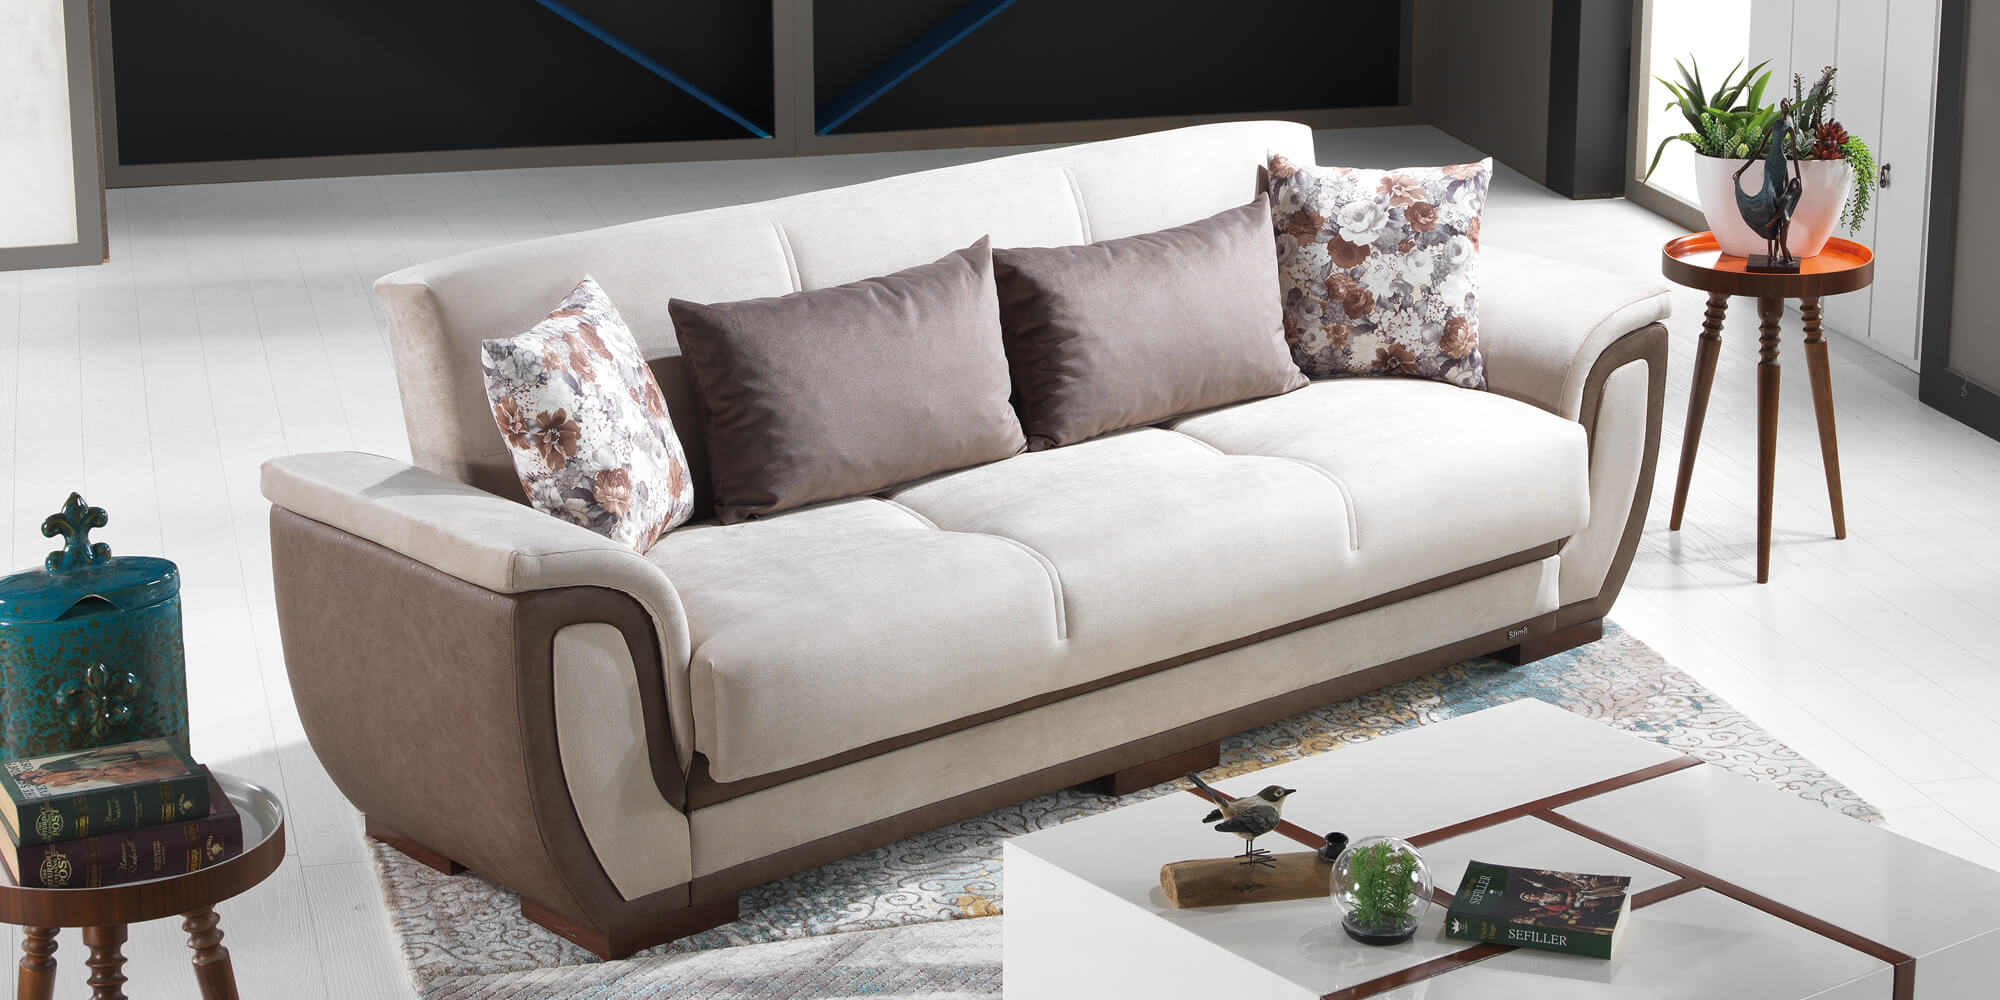 tempo 3 2 1 maxi sofa set yuvam m belhaus in wuppertal cilek offizieller h ndler in europa. Black Bedroom Furniture Sets. Home Design Ideas